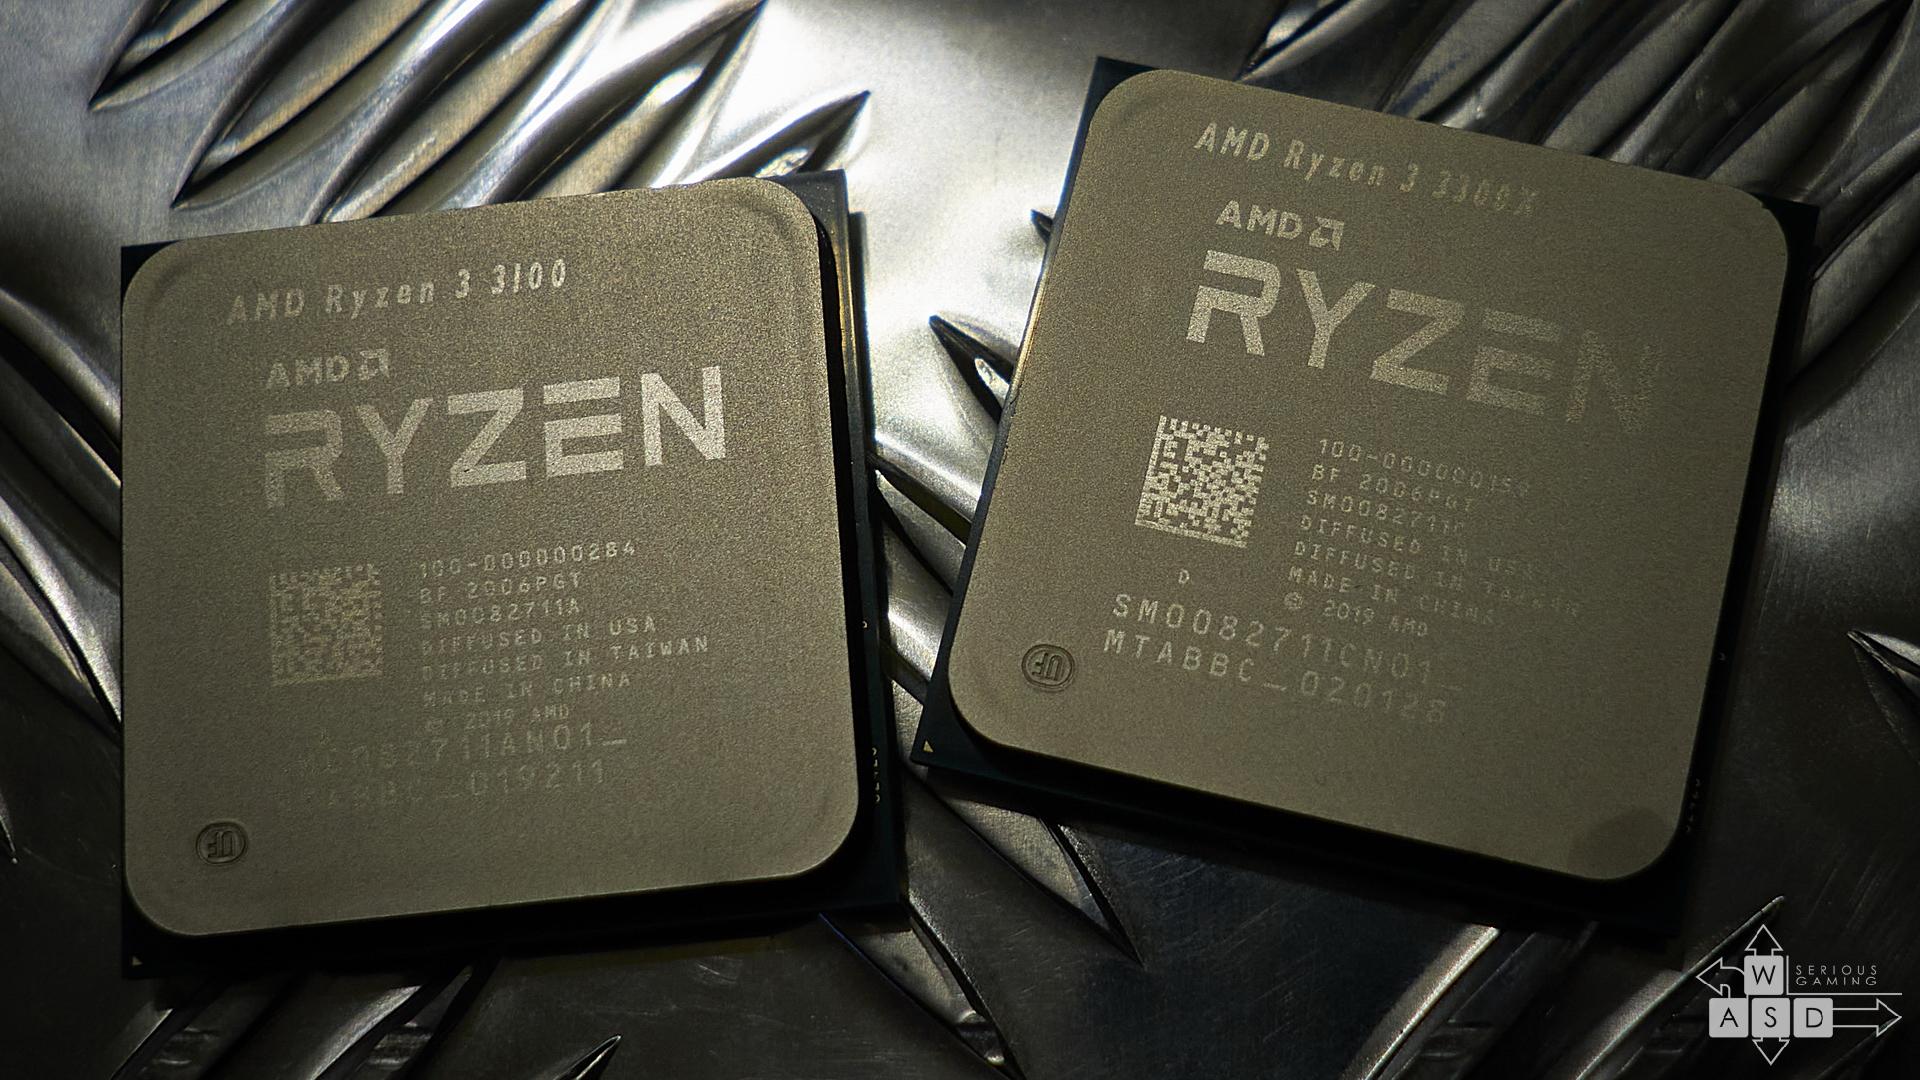 AMD Ryzen 3 3100 & 3300X review | WASD